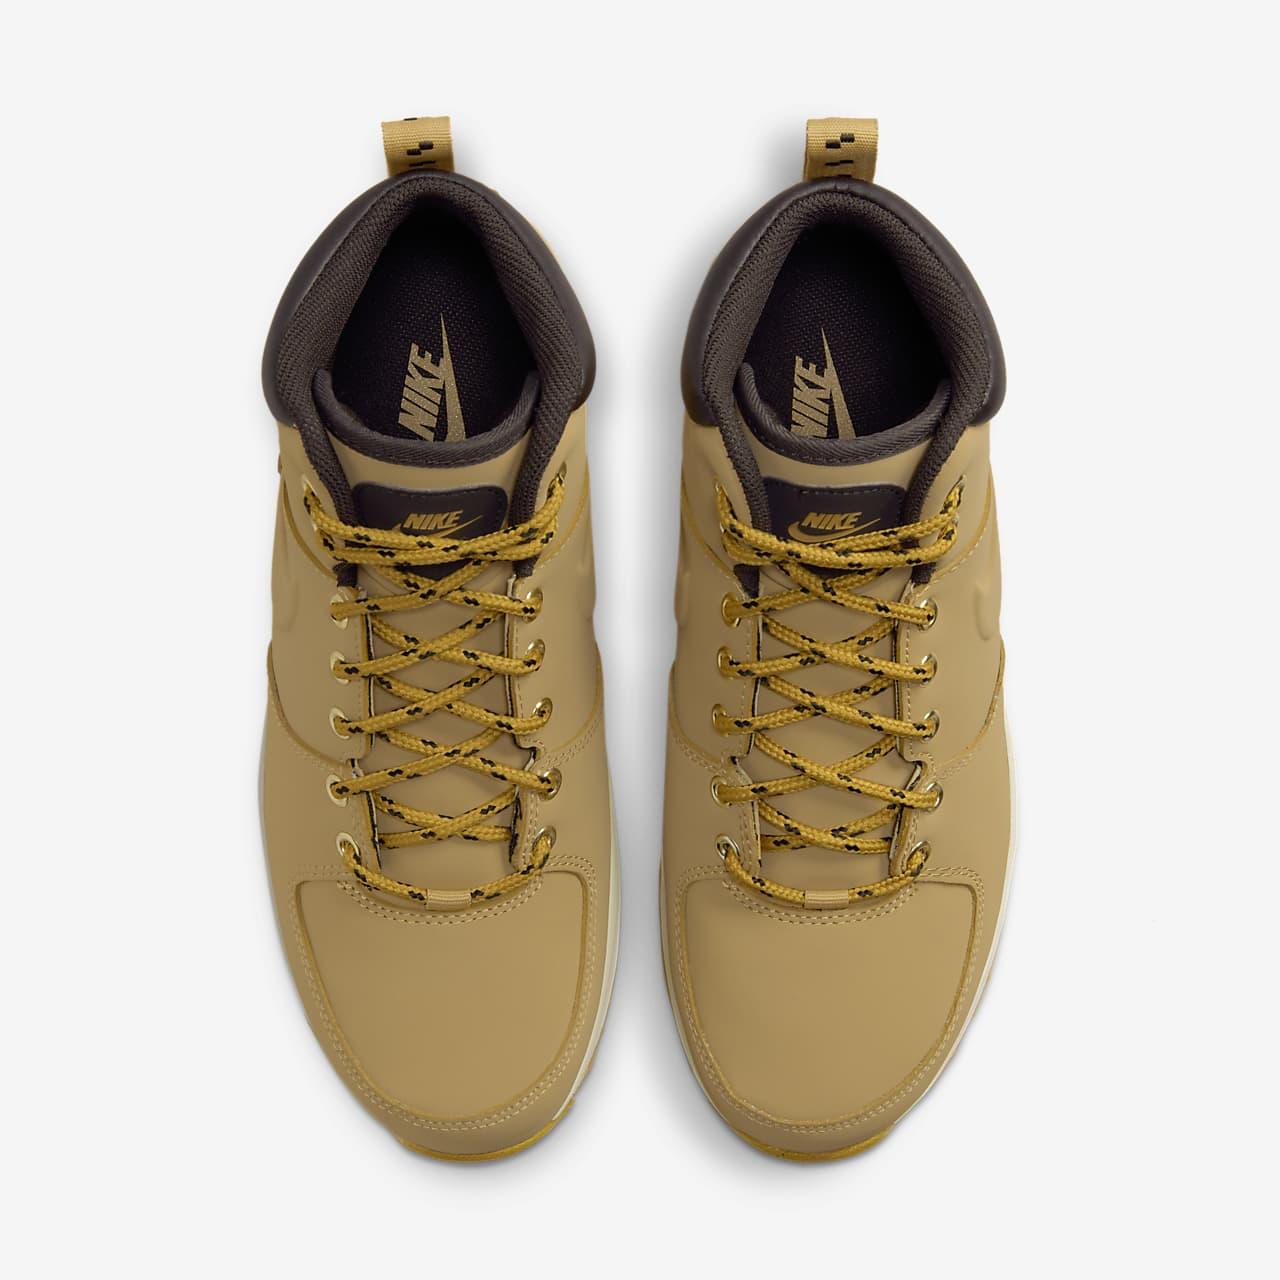 new concept a3a56 e14a4 ... Chaussure Nike Manoa pour Homme